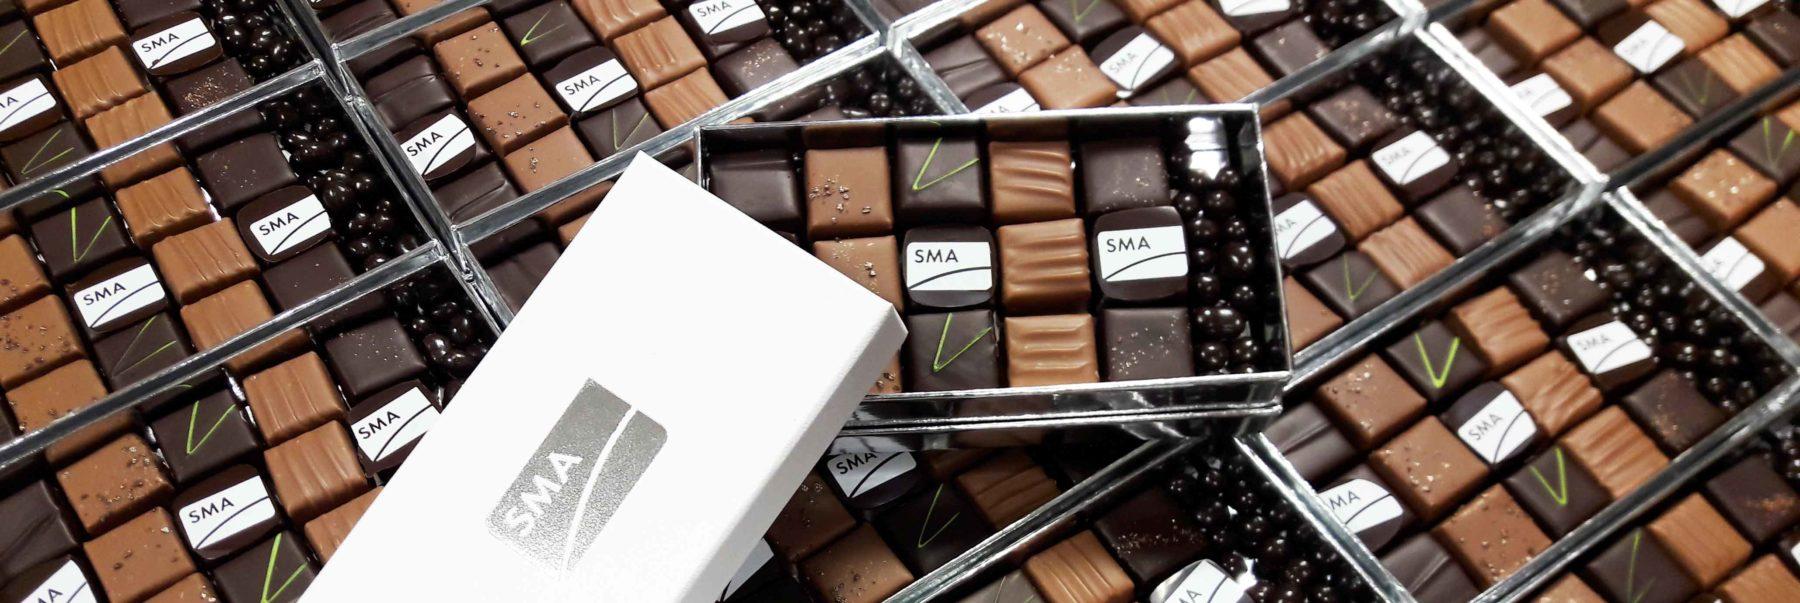 impression sur chocolat